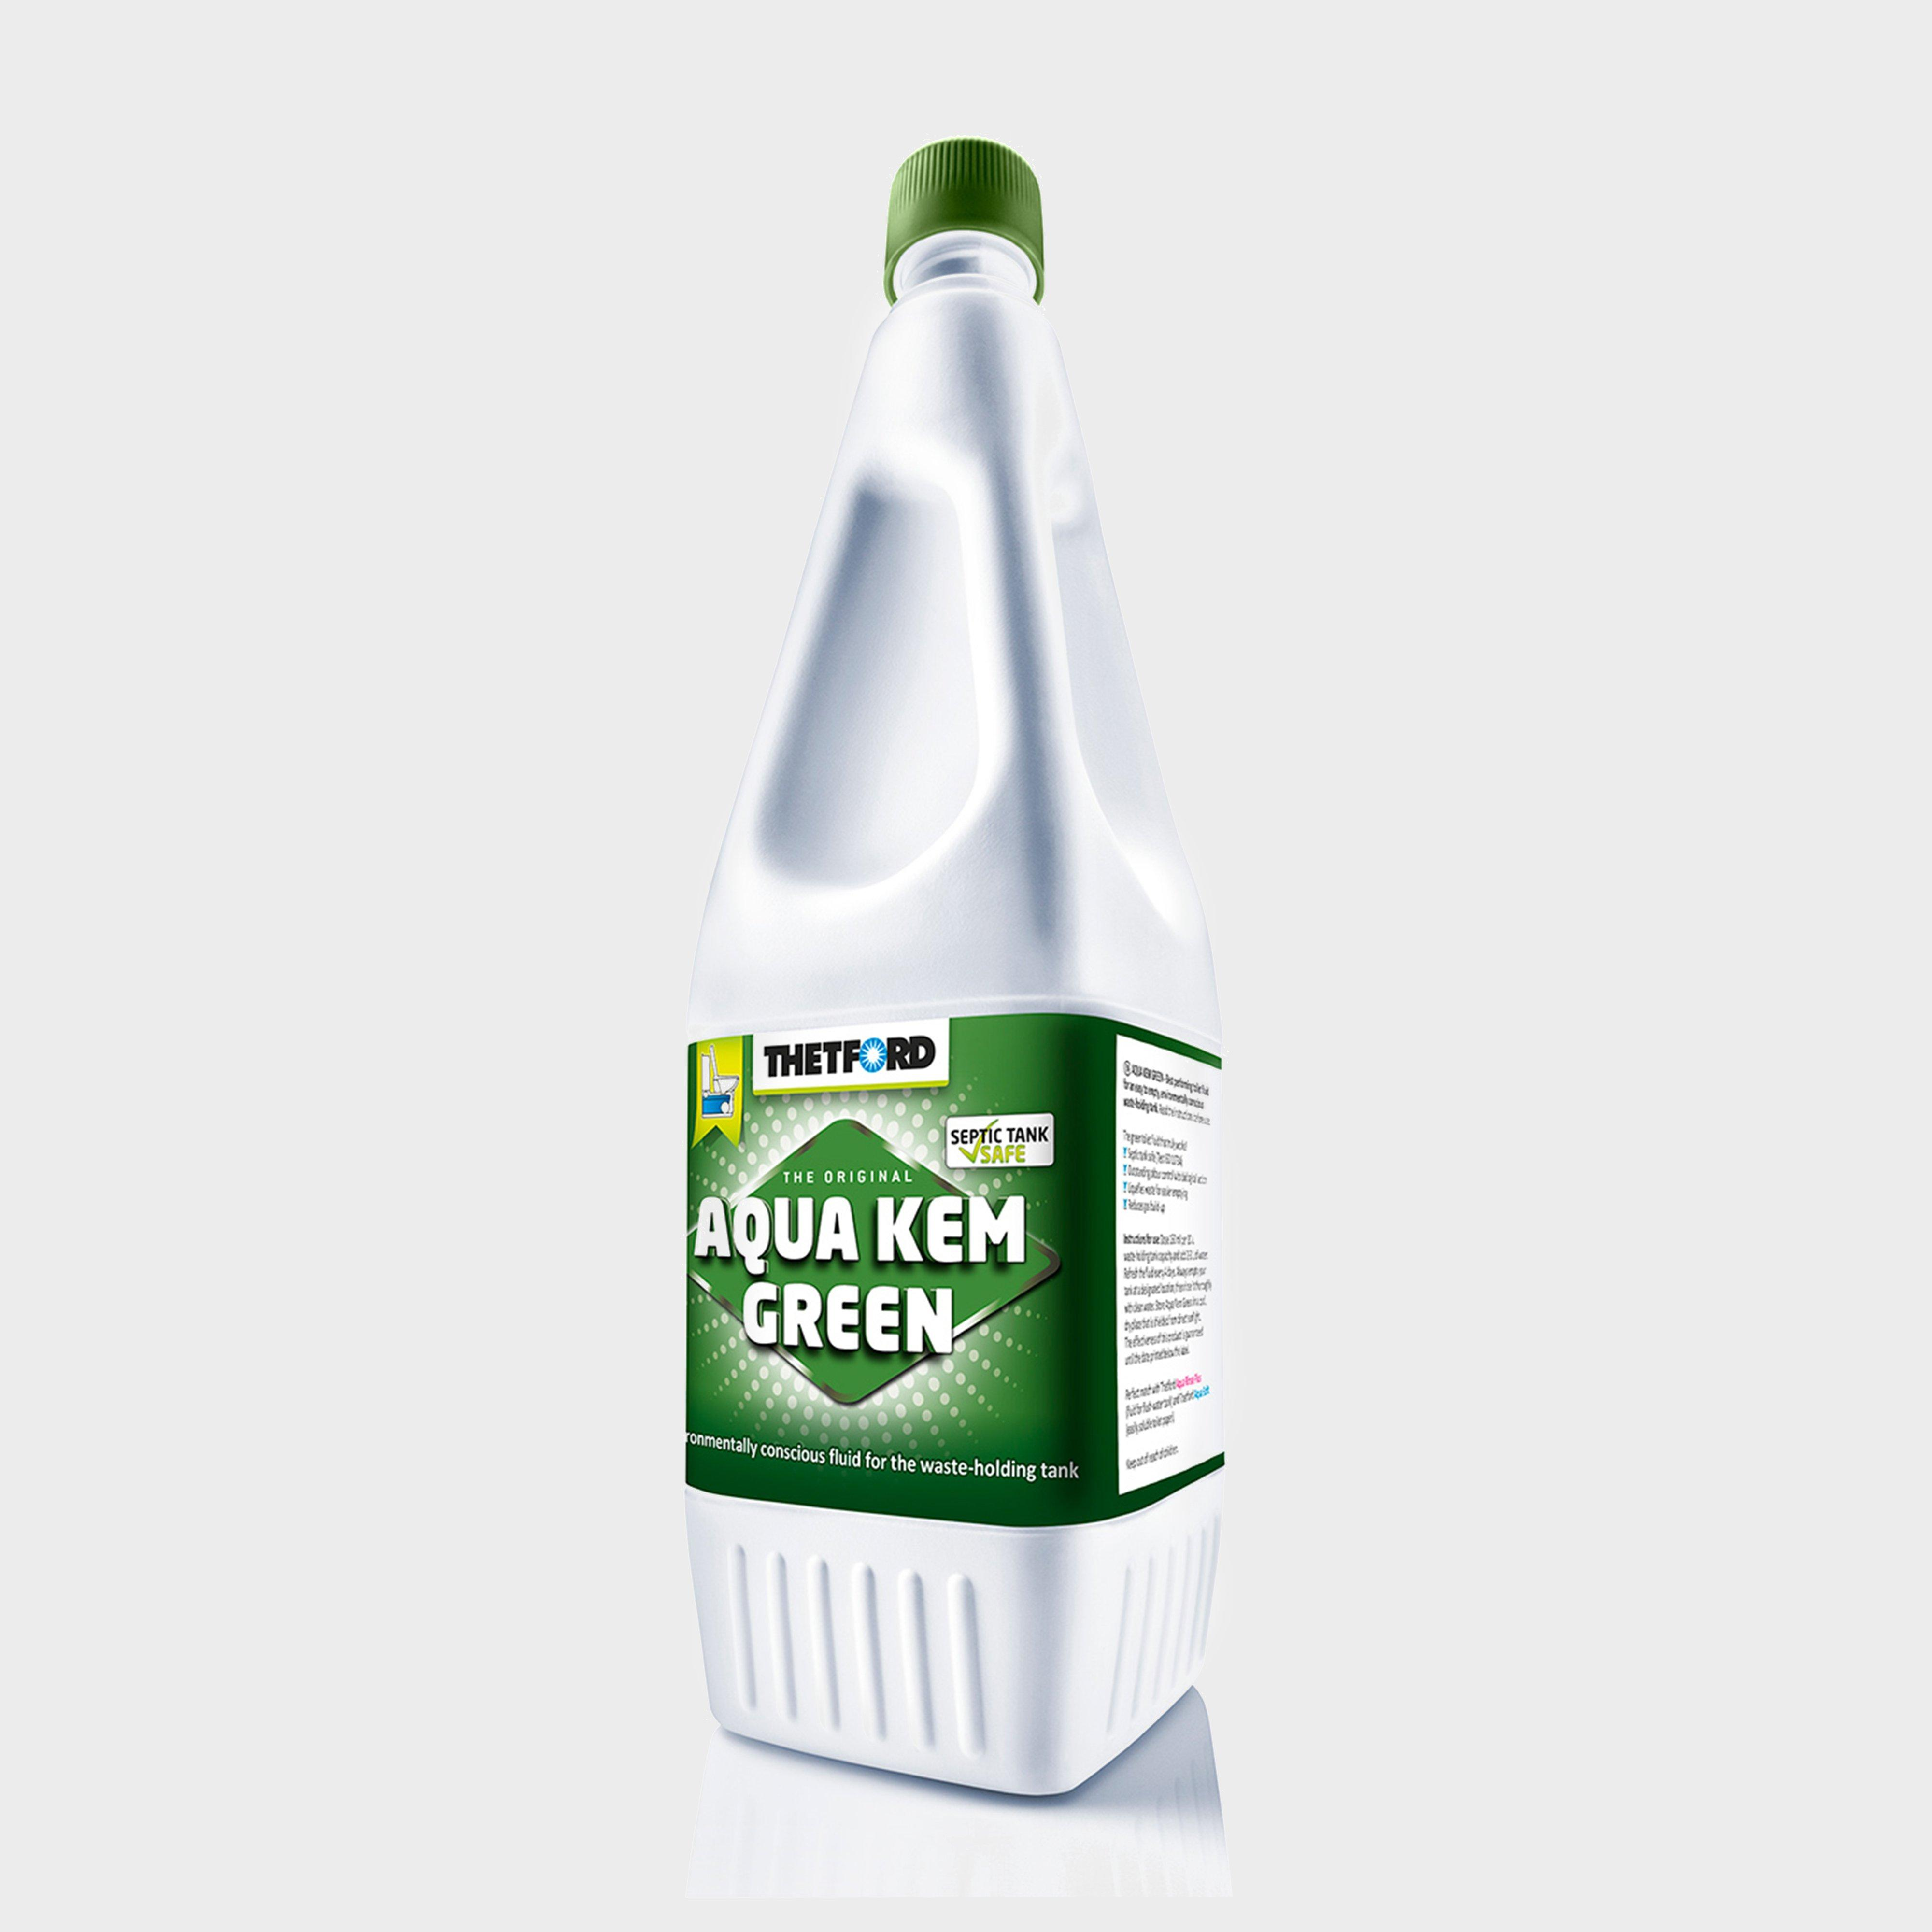 Thetford Thetford Aqua Kem Green Toilet Fluid (1.5 Litre), Green